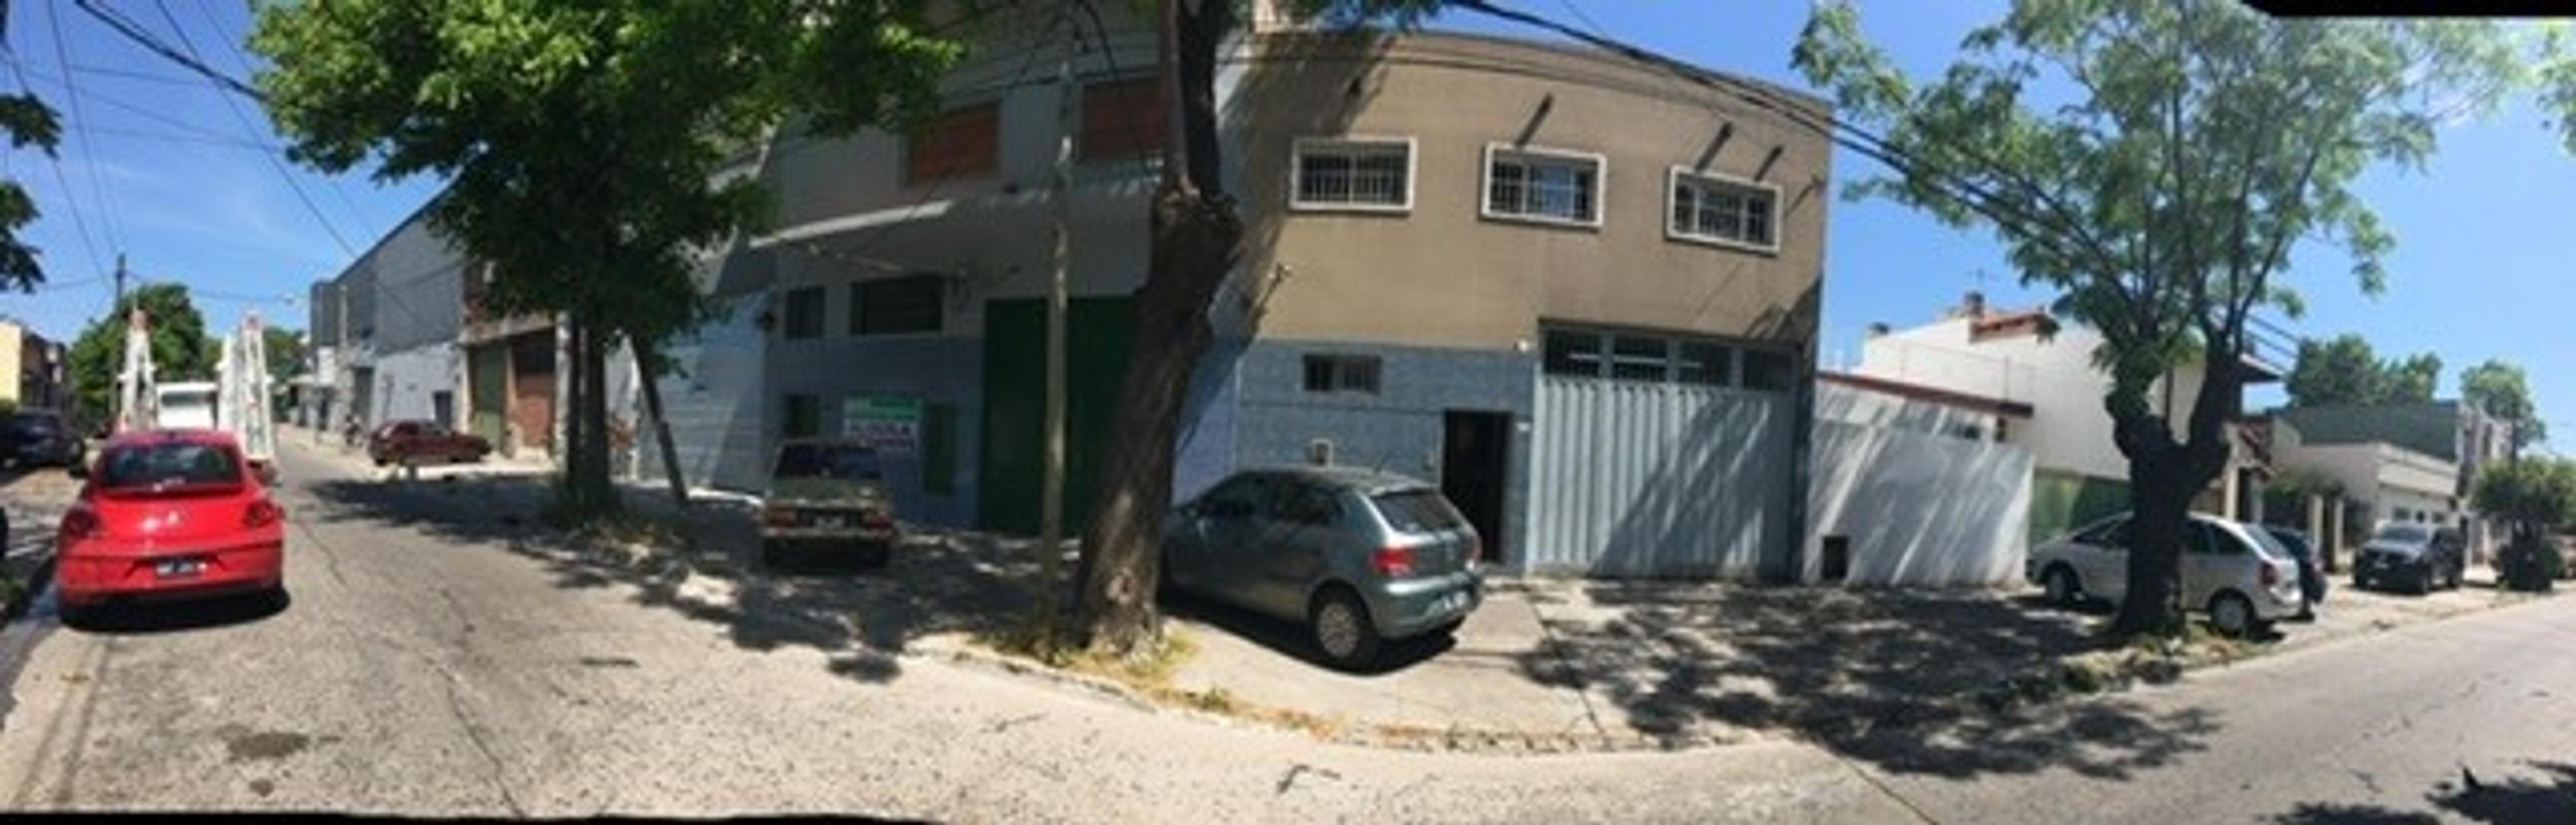 Alquiler, galpon en zona industrial/comercial, San Martin, Gral Paz, Capital Federal